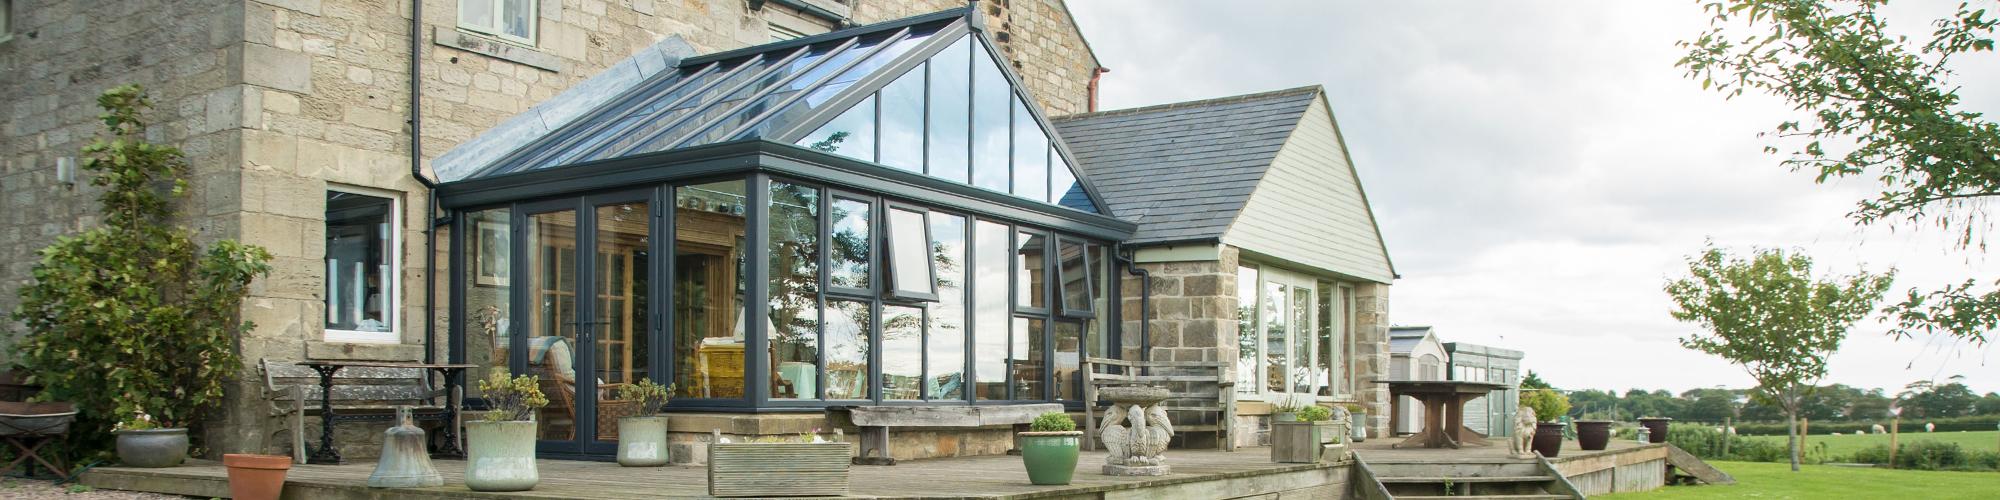 Gable conservatory Sherborne